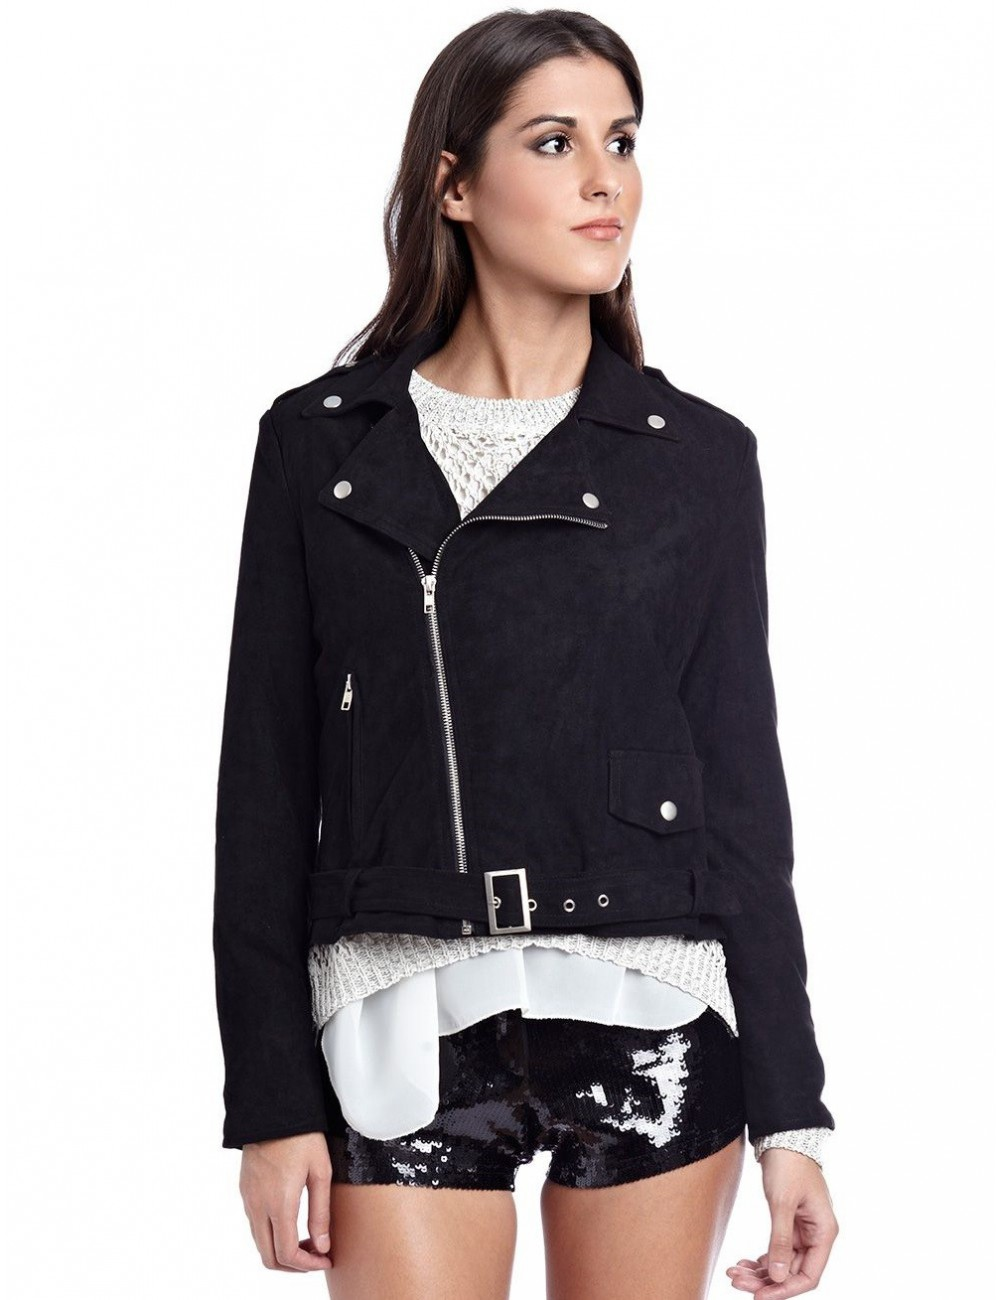 giacca sportiva donna nera